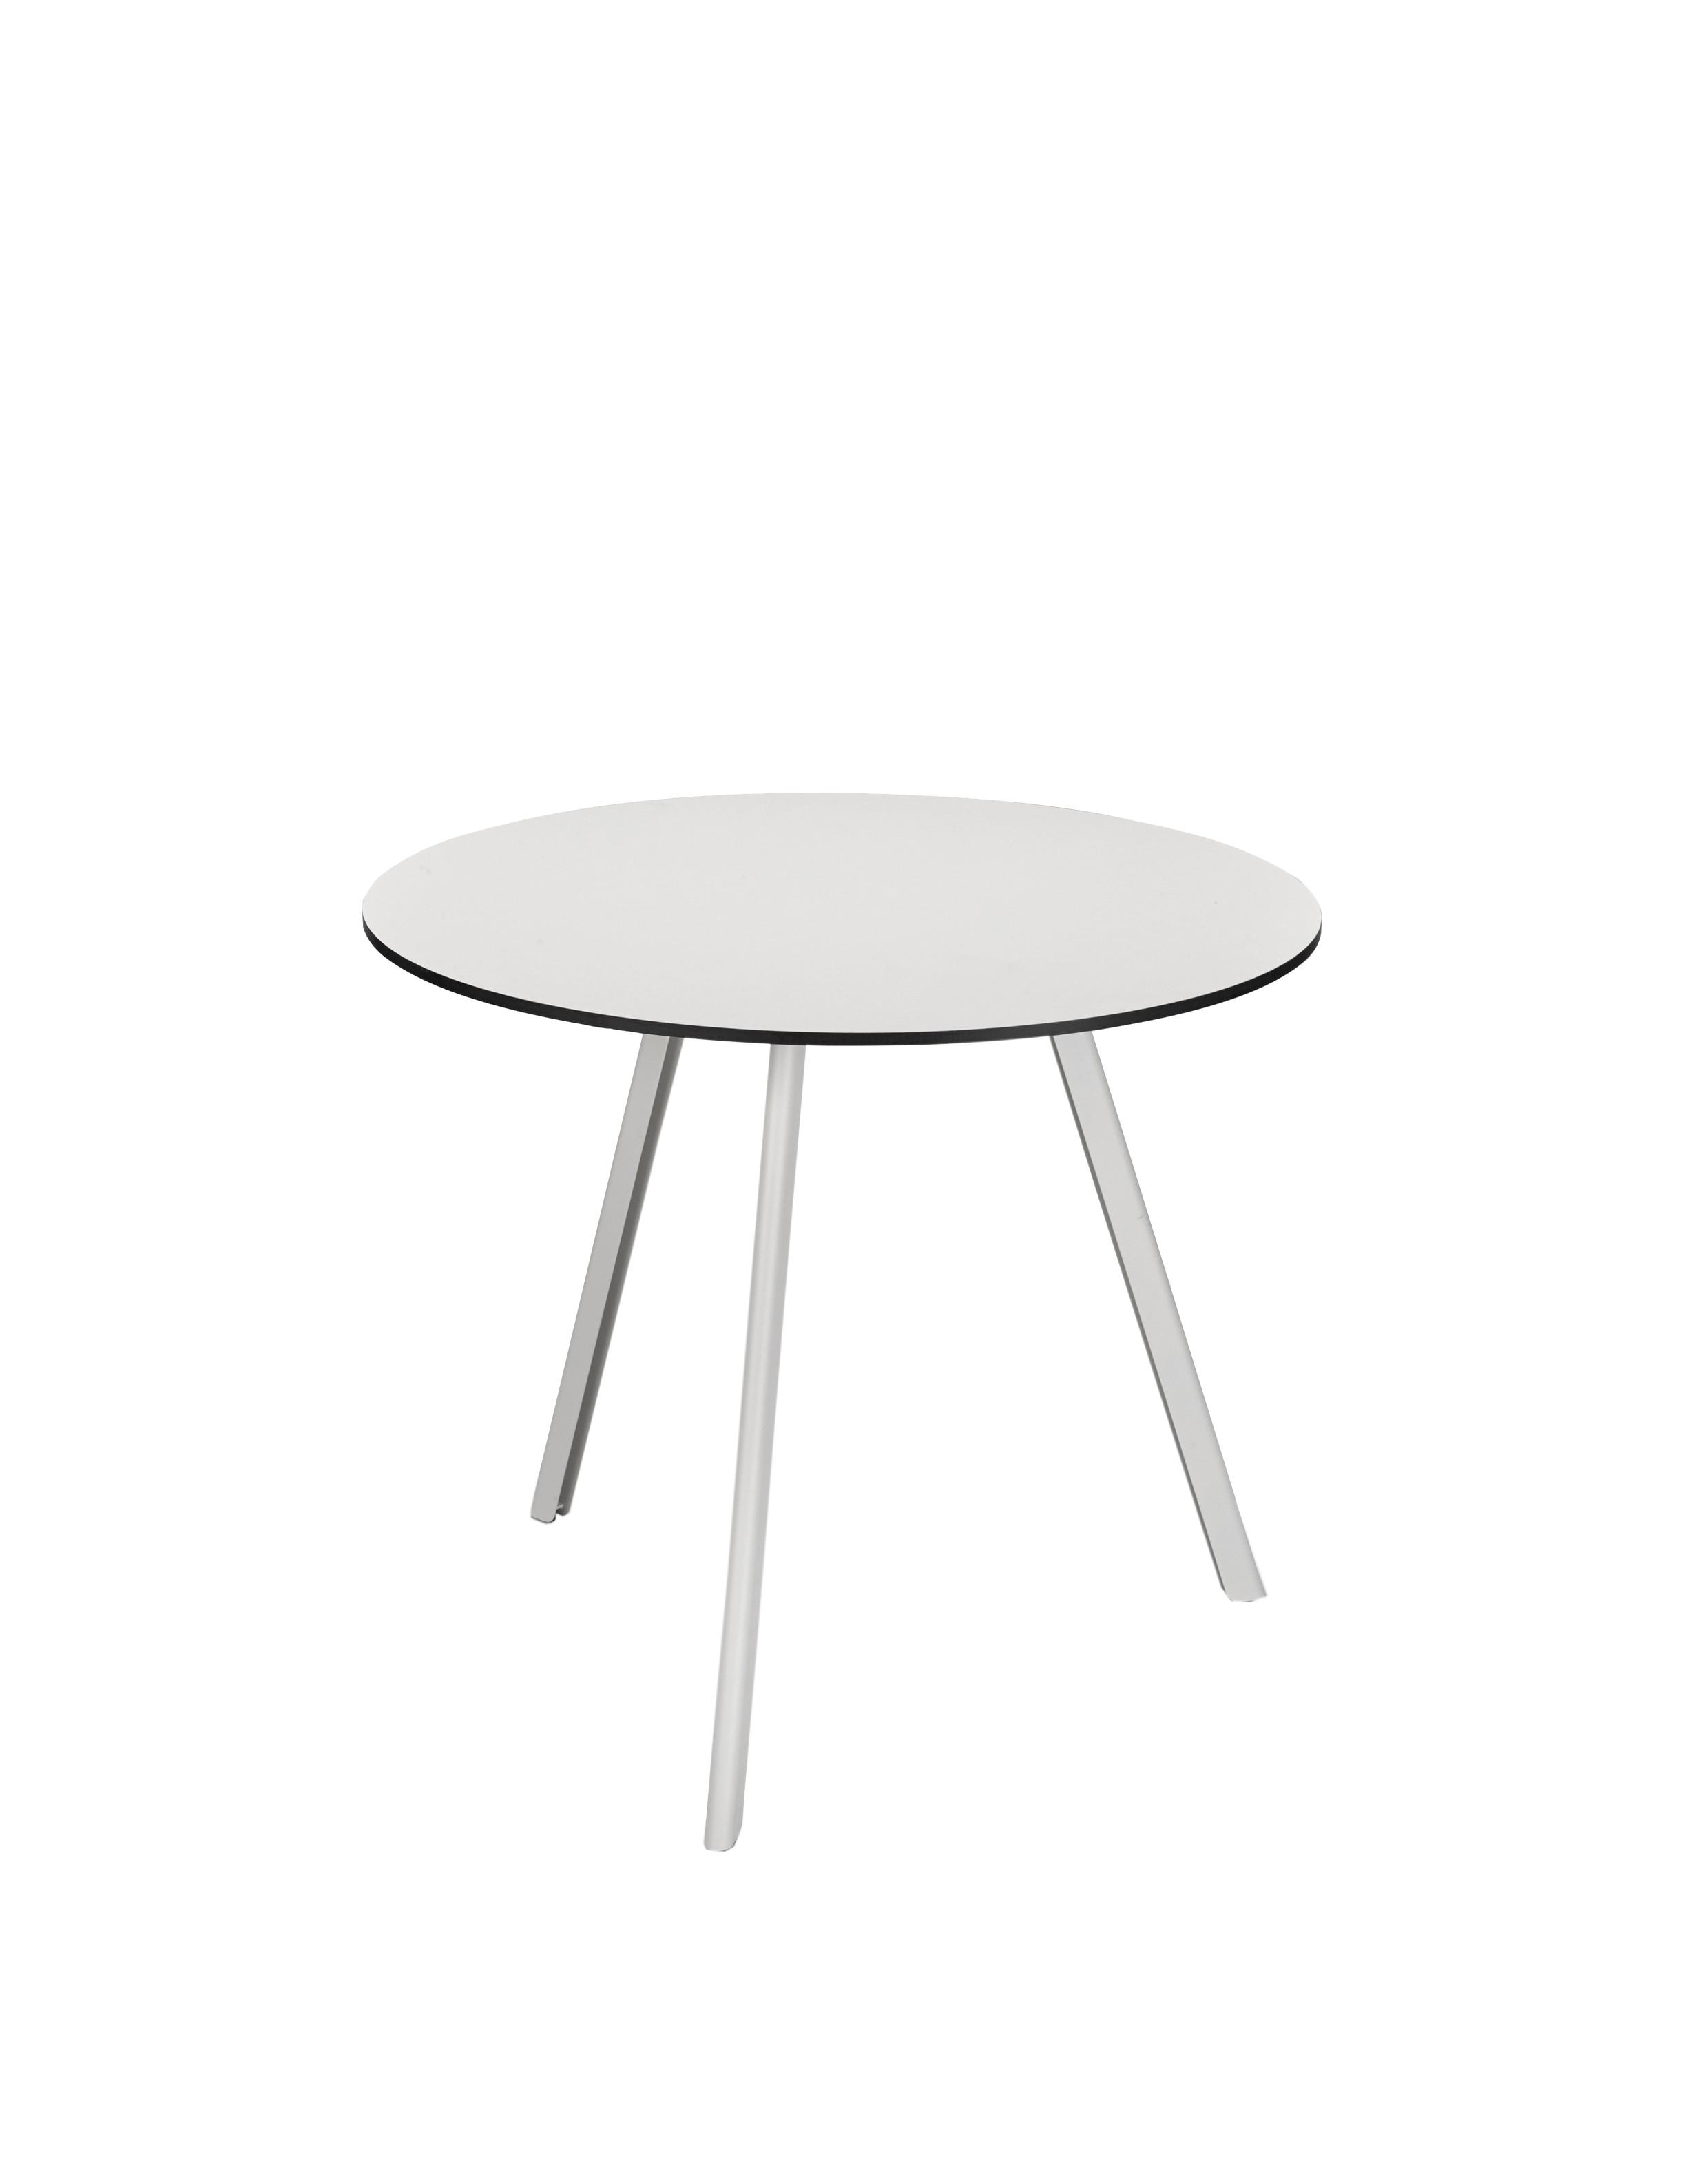 table d 39 appoint overlap de skagerak d 85 blanc argent. Black Bedroom Furniture Sets. Home Design Ideas